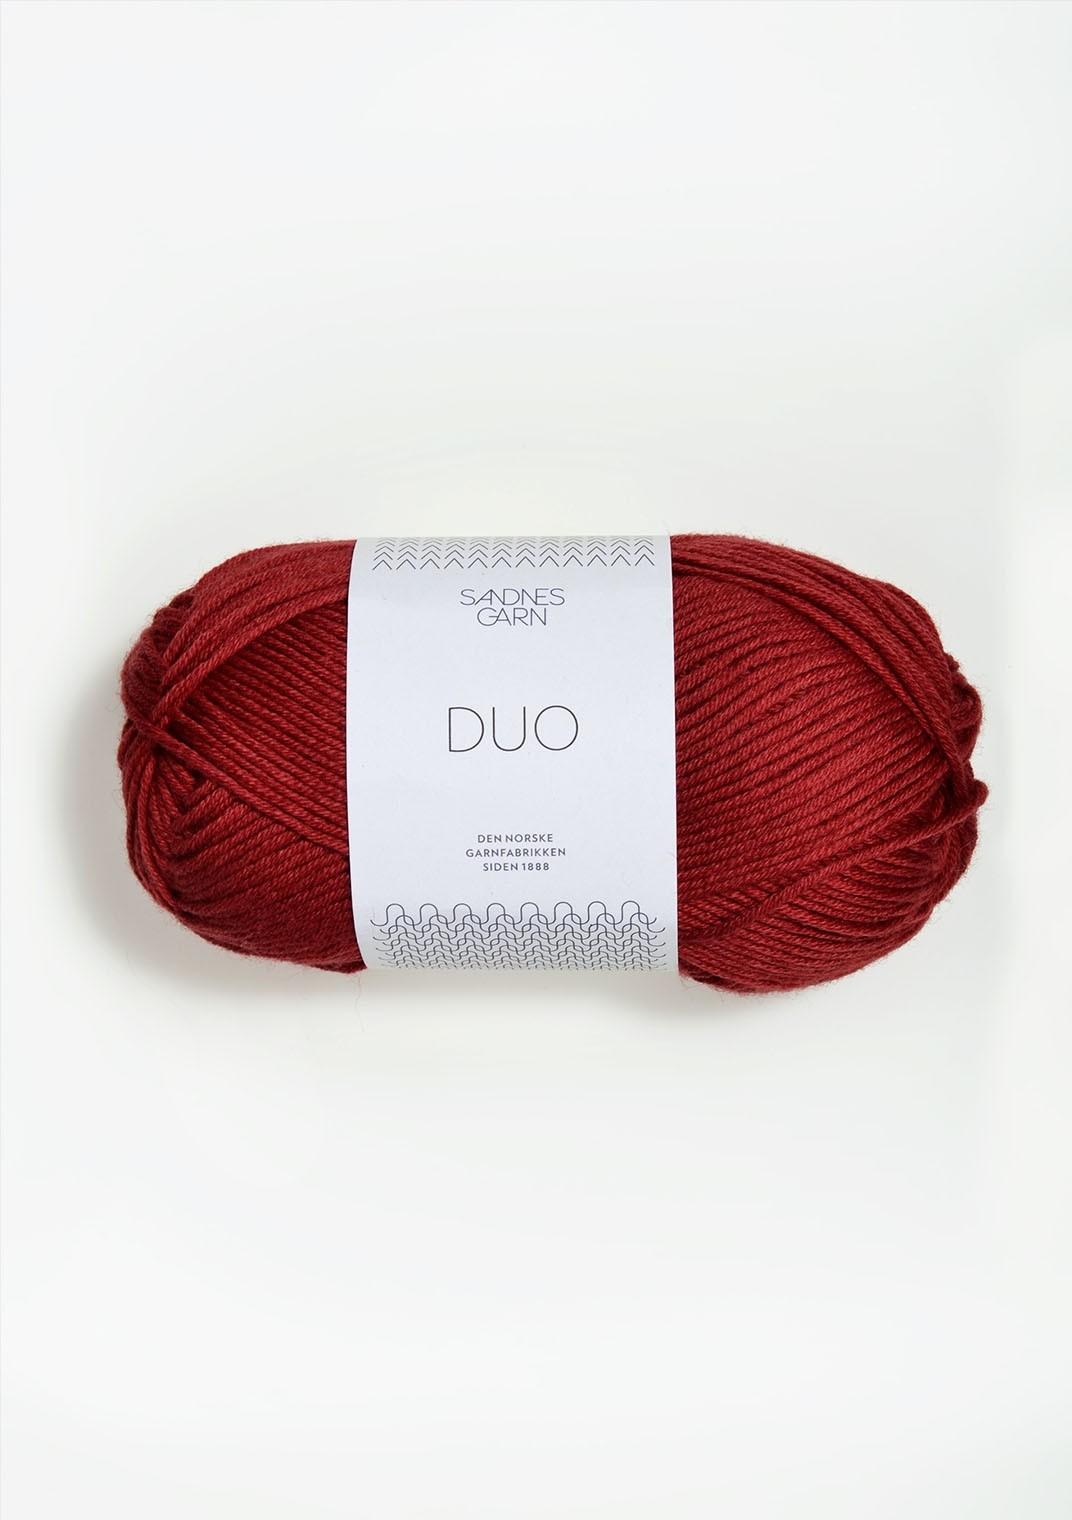 Sandnes 4236 dyp rød DUO